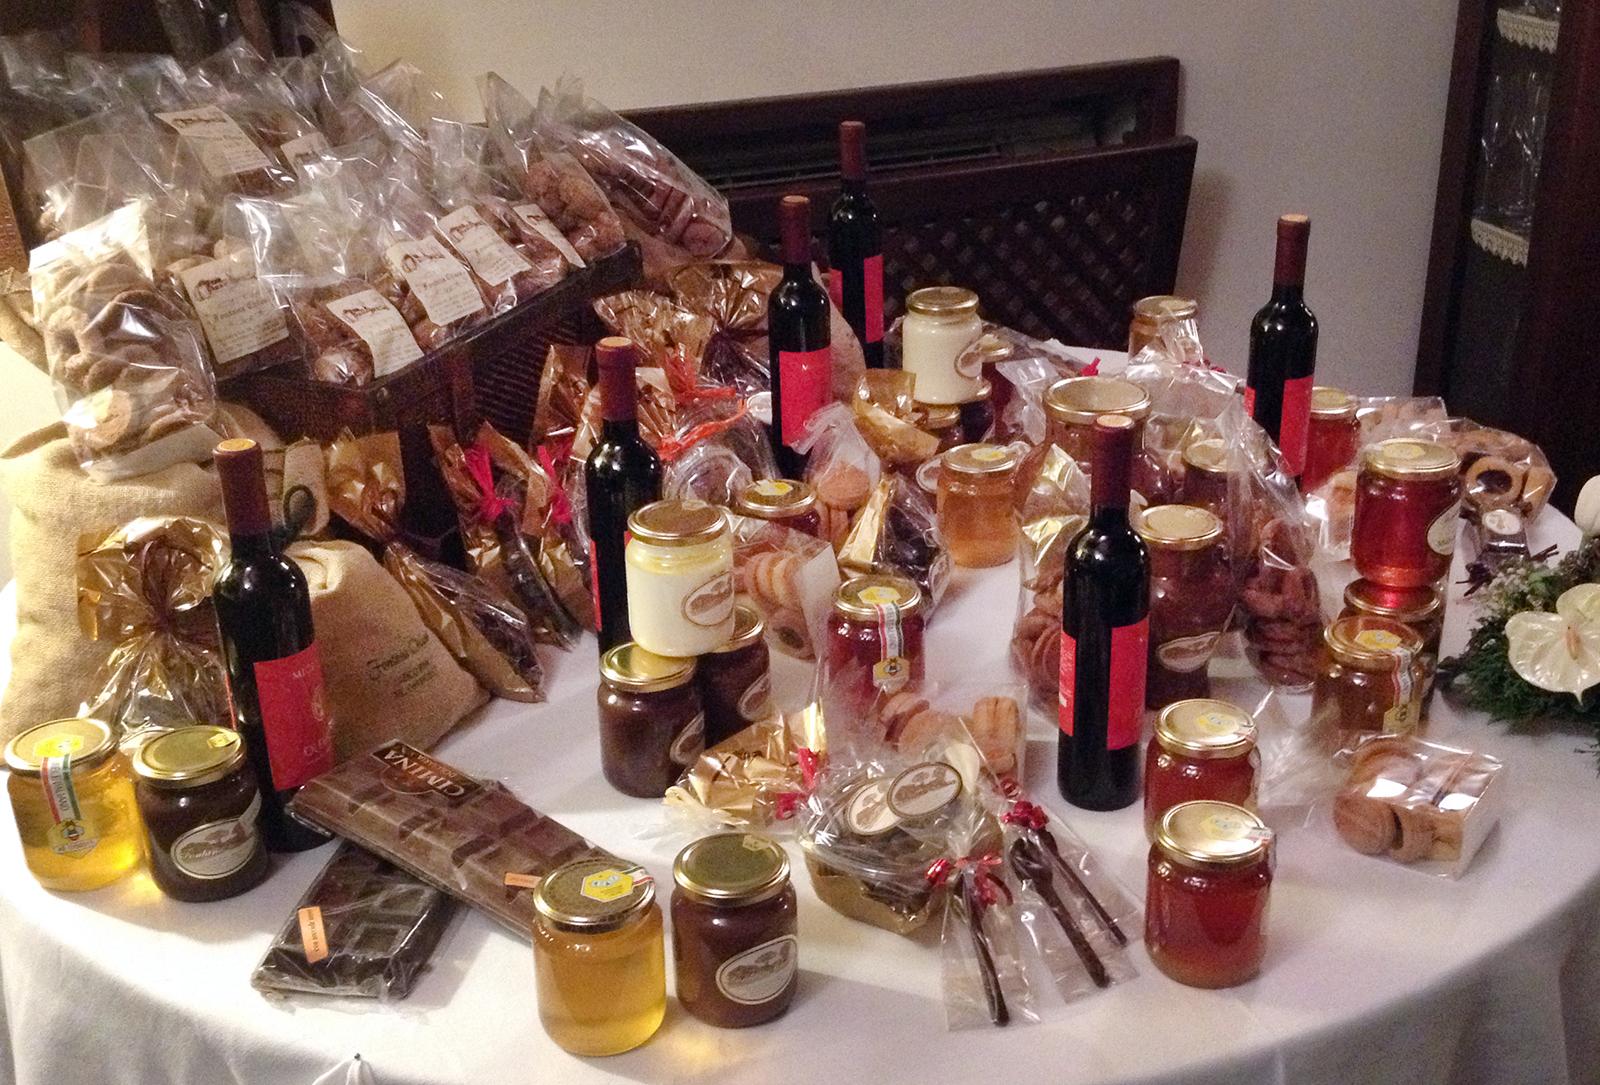 Miele e liquori artigianali